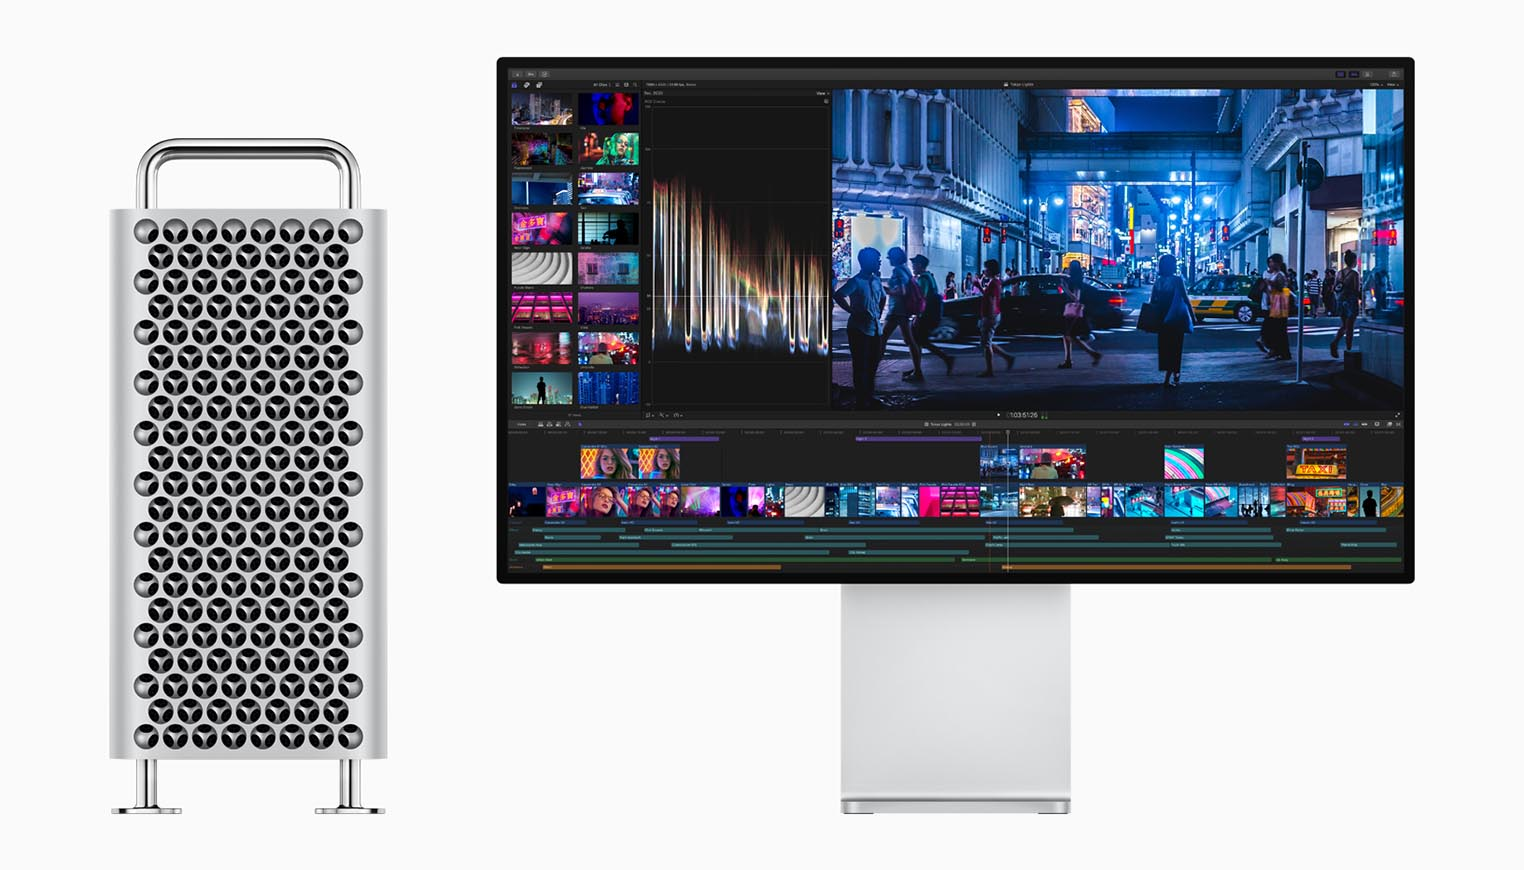 Mac Pro 2019 Apple Pro Display XDR